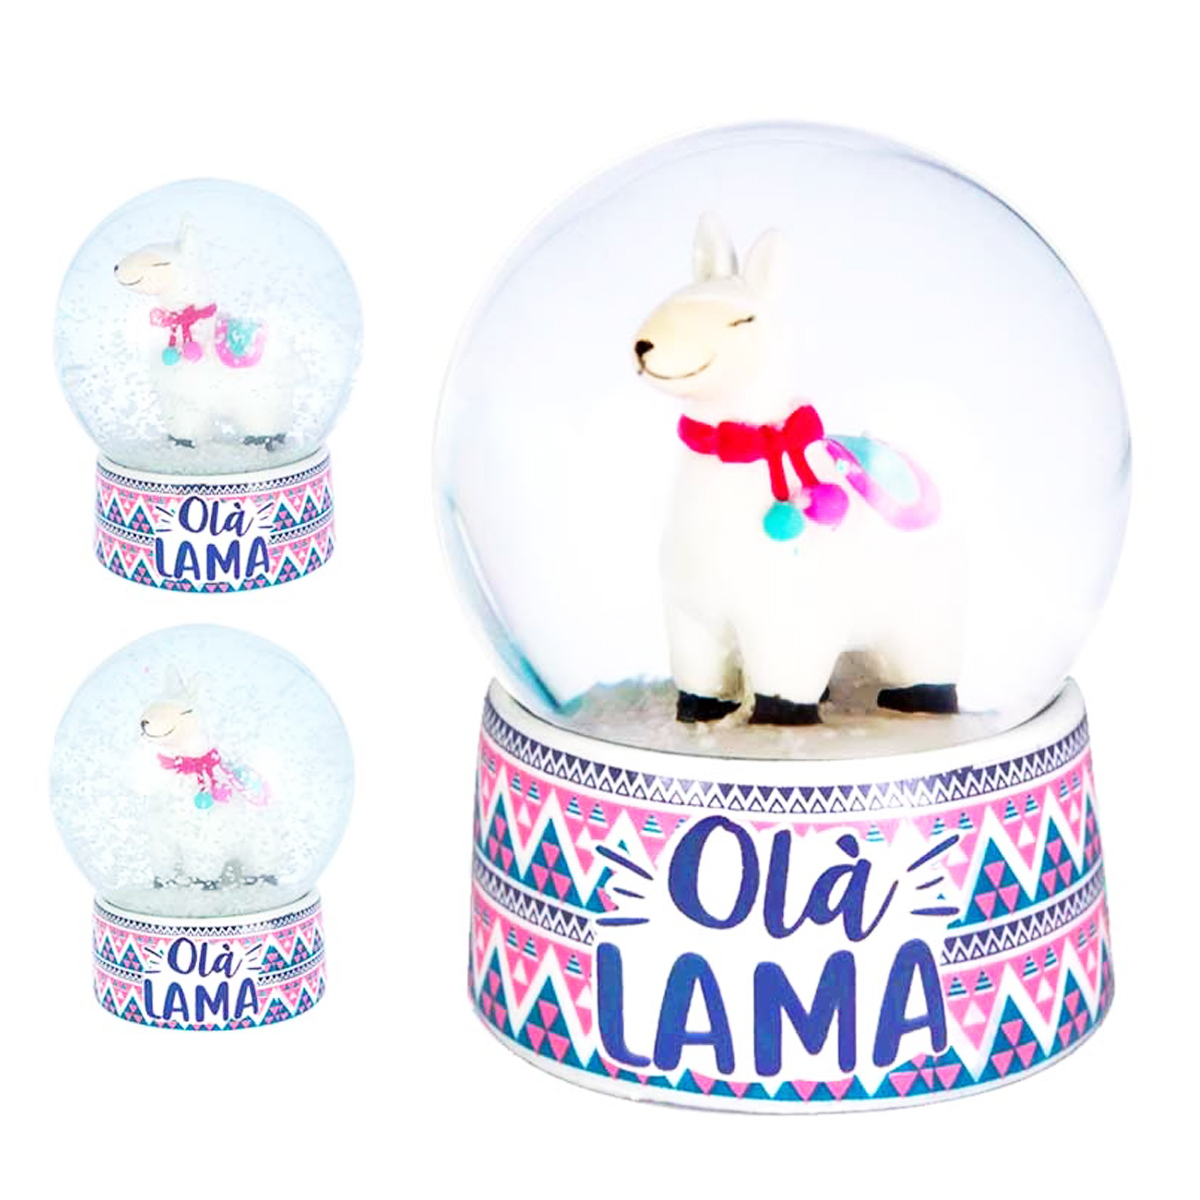 Boule de neige \'Lama Mania\' blanc rose (Olà Lama) - 85x65 cm - [Q0841]